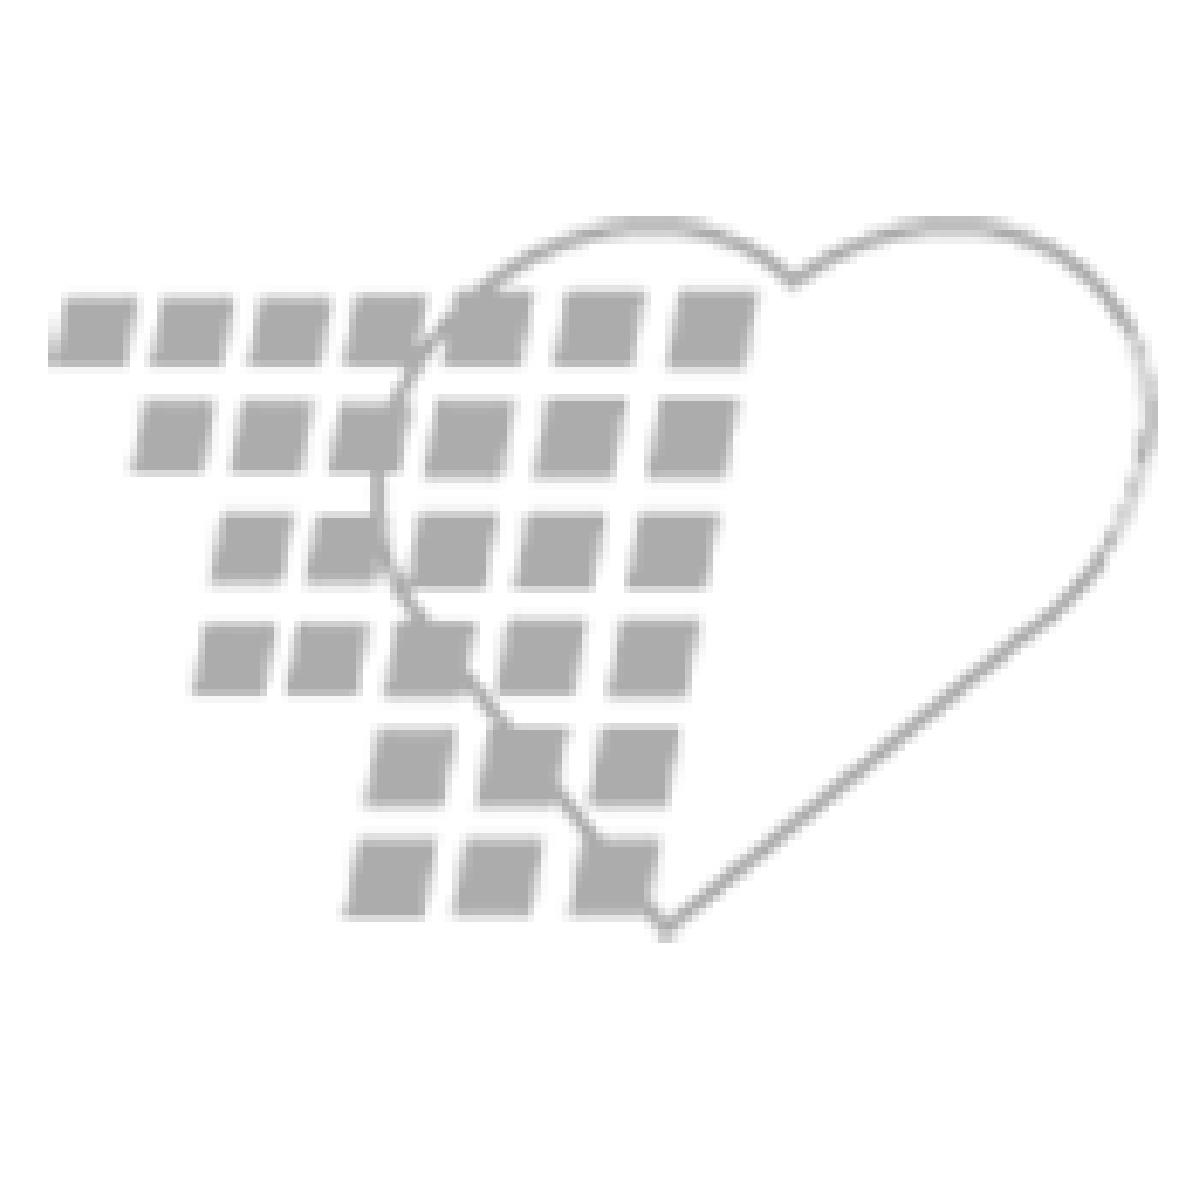 03-32-4650 - LYSOL® Disinfectant Spray - Original Scent - (ships ORMD)